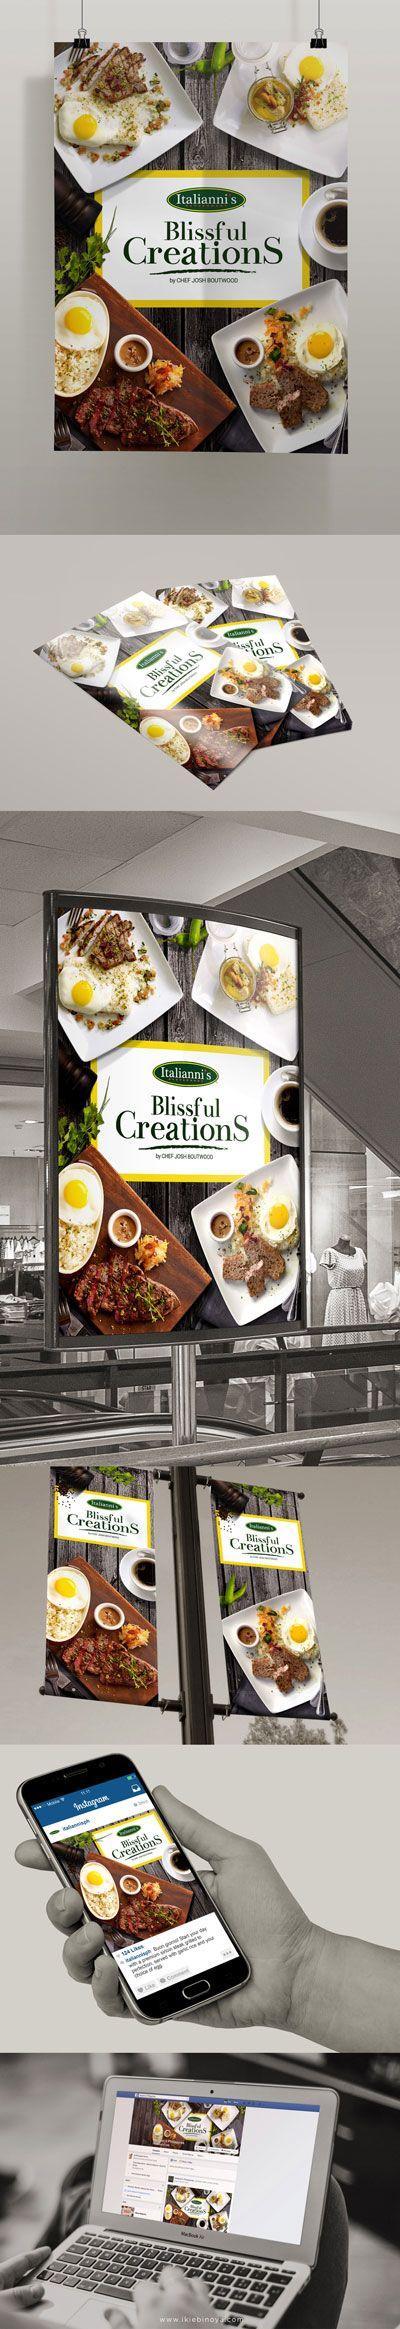 Created by Ikie Binoya Design & Photography www.ikiebinoya.com #graphic #design #poster #food #italiannis #print #campaign #restaurant #breakfast #morning #meat #steak #inspiration